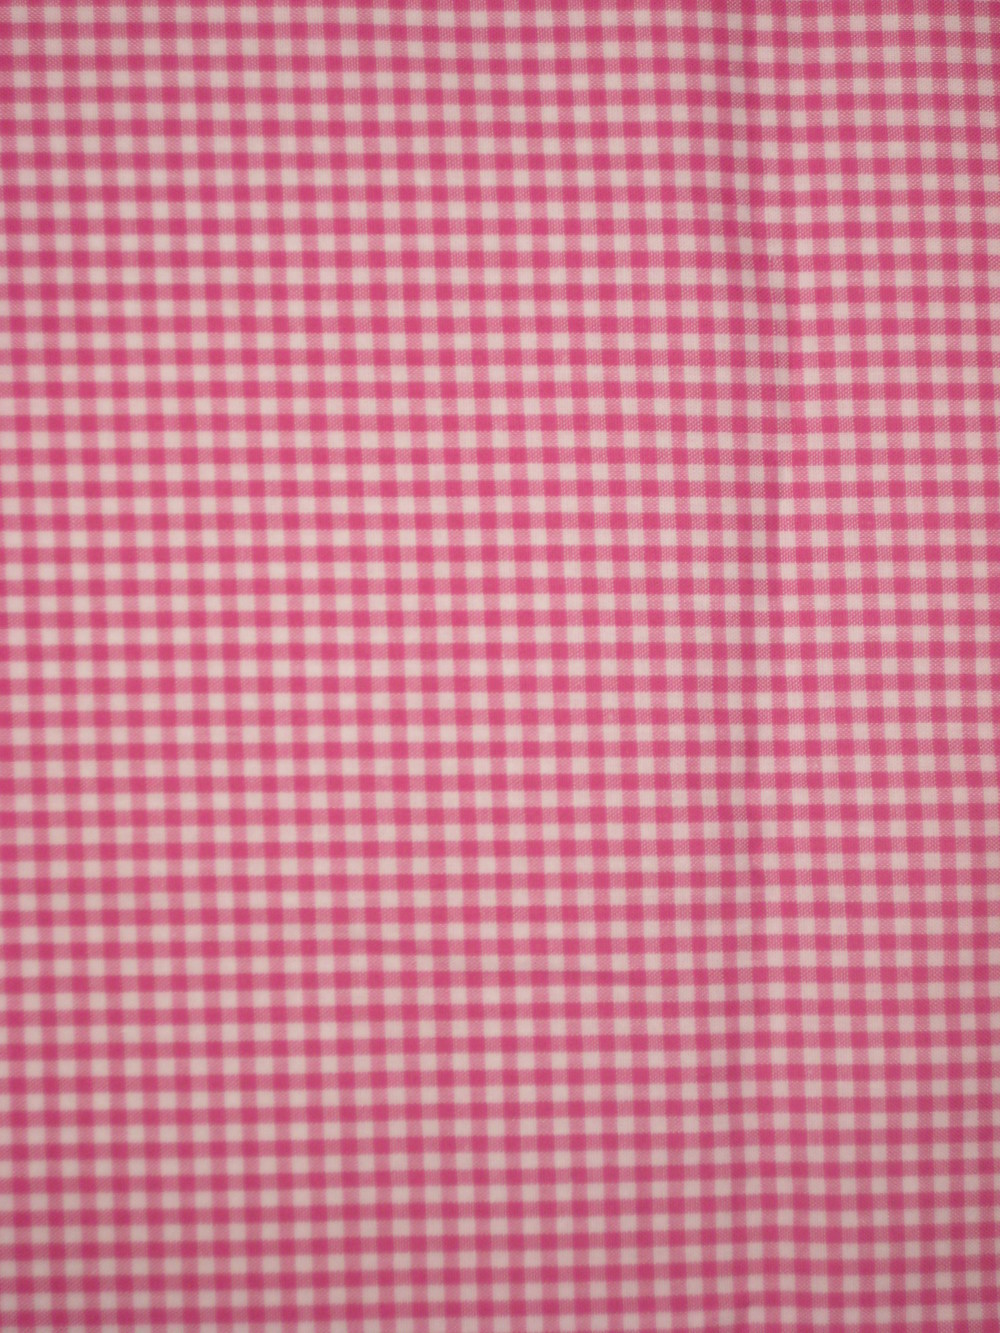 Pink Gingham pt8.jpg